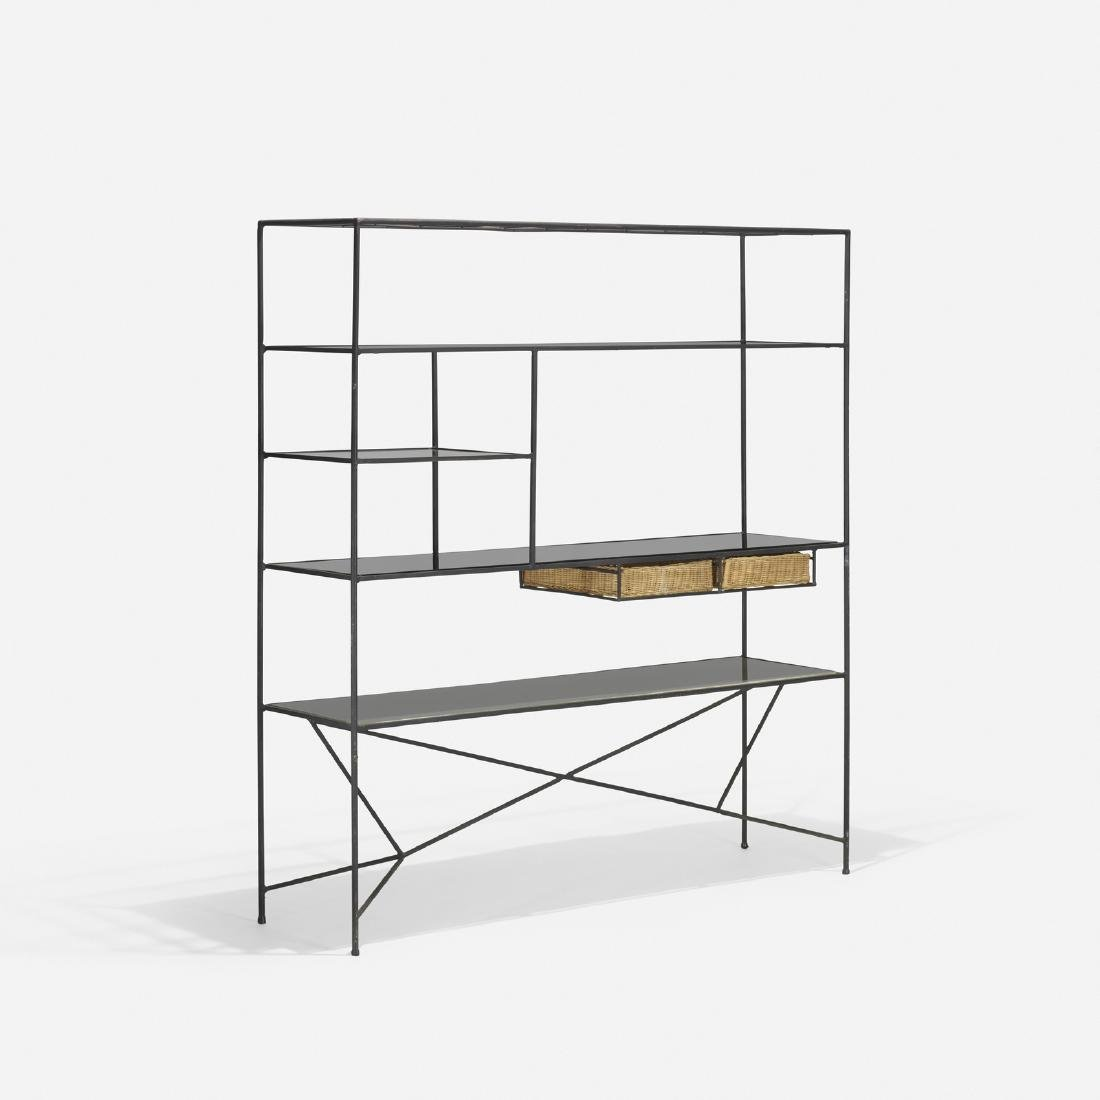 Paul McCobb, Pavilion Collection room divider (6000)